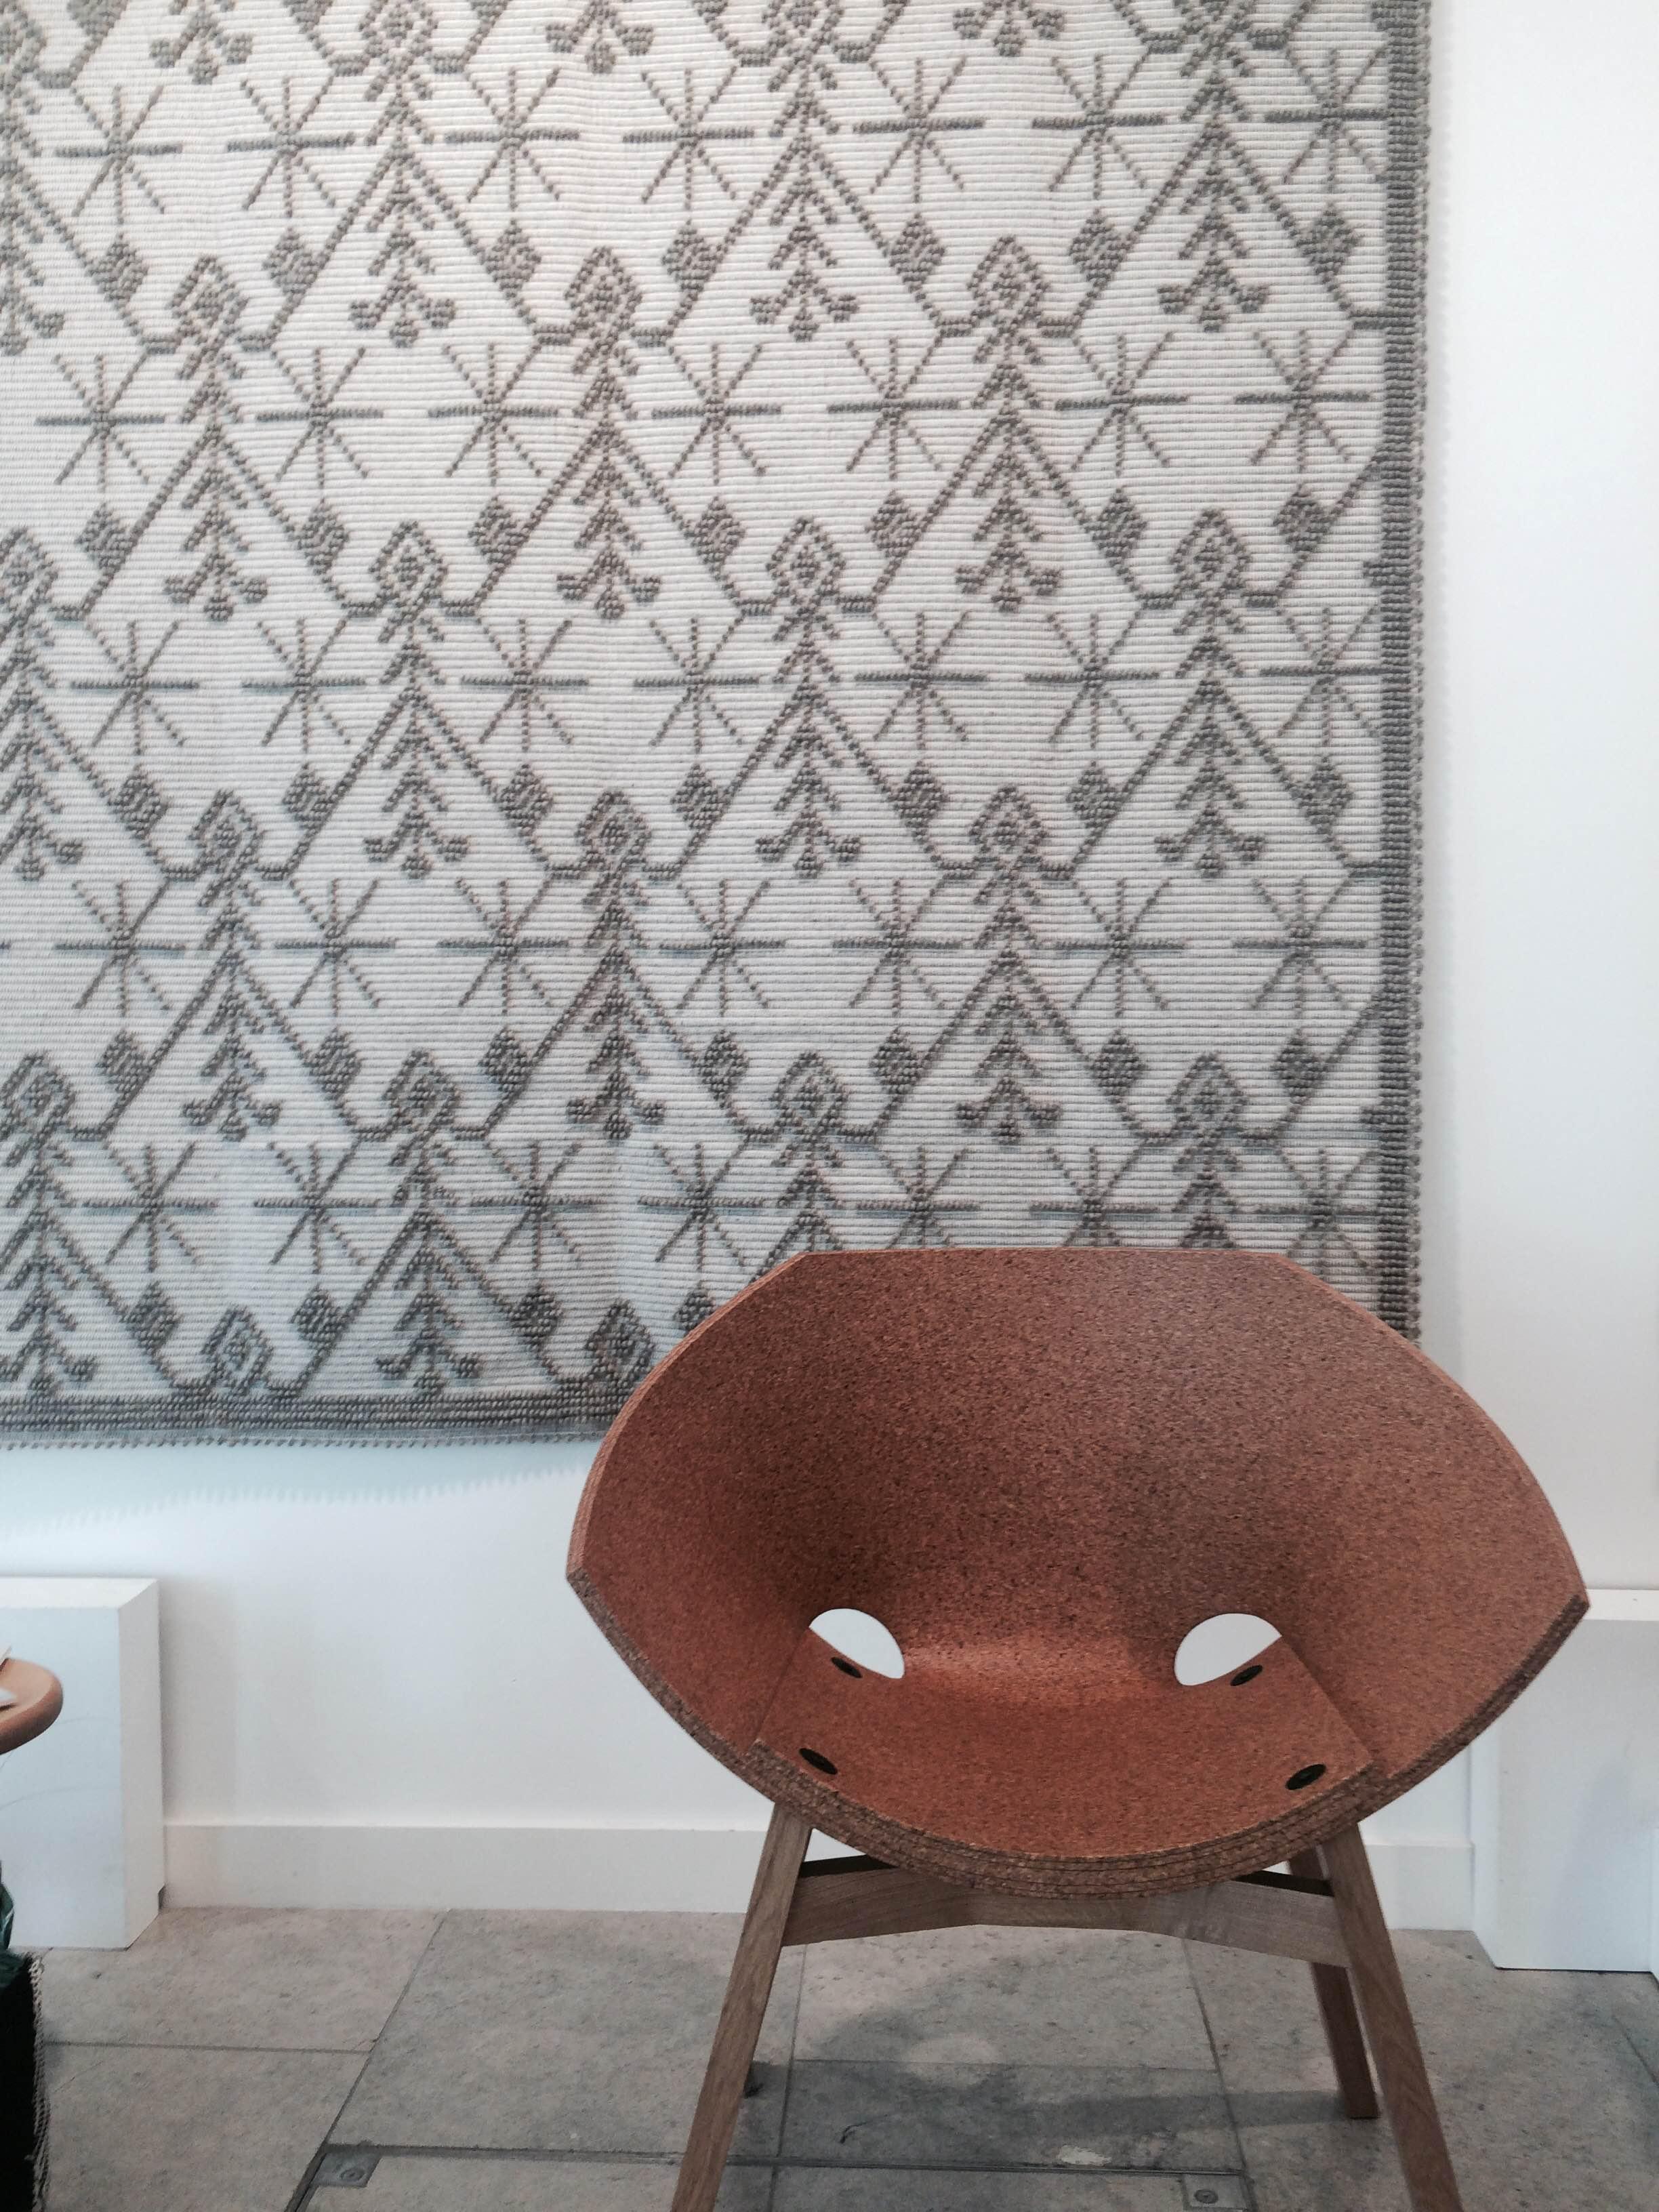 Prato and Corkigami chair by Carlos Ortega Design.JPG